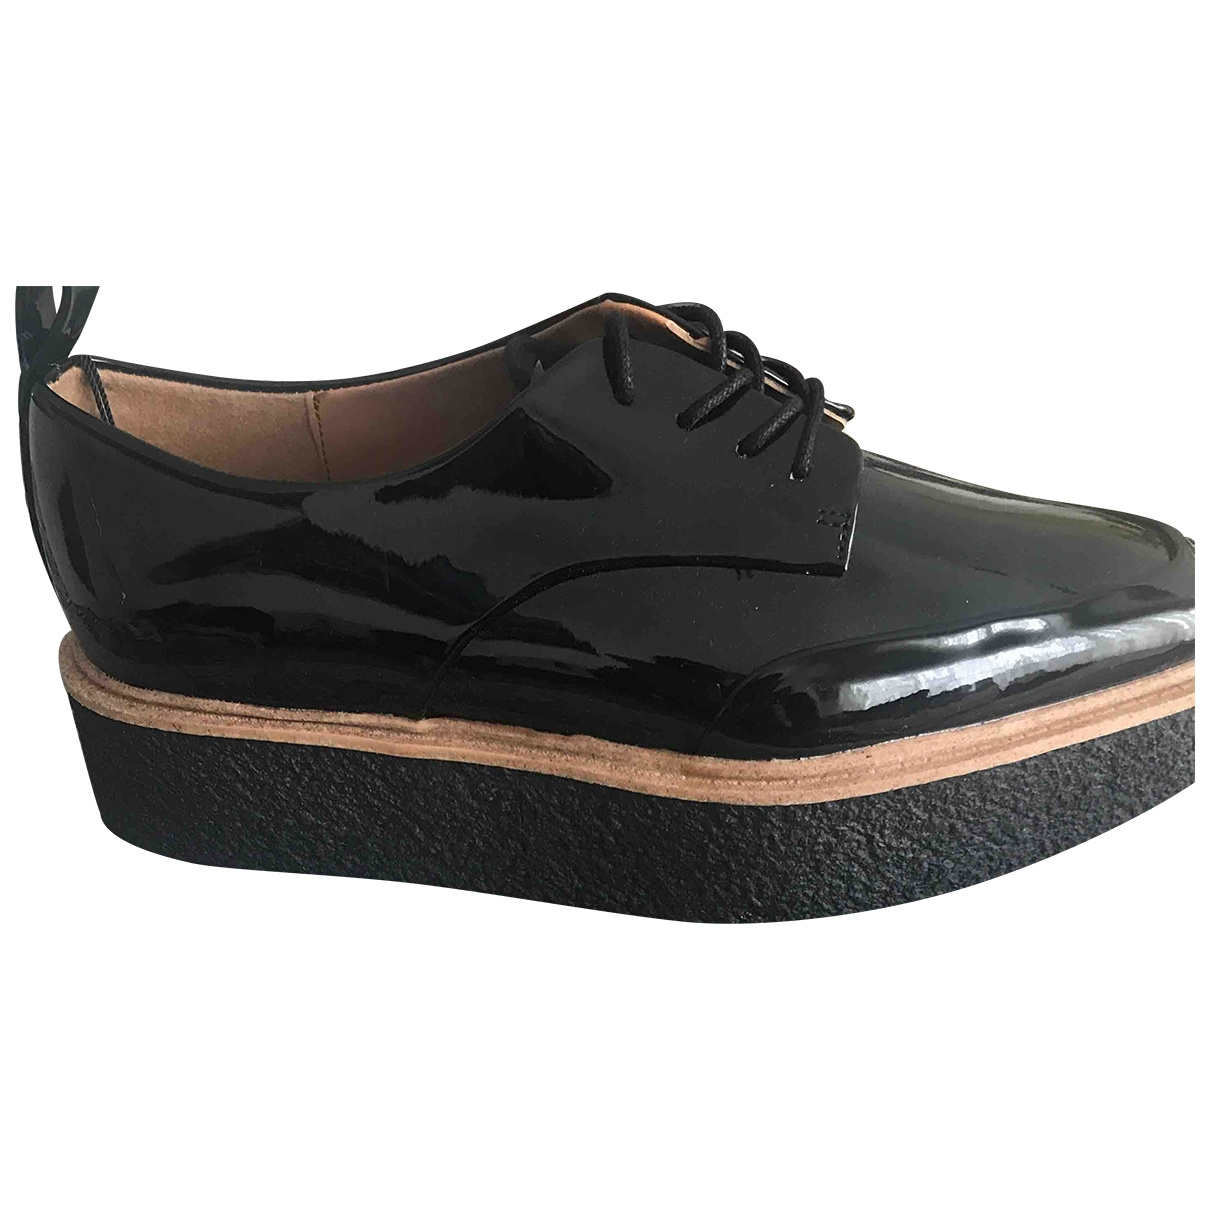 Zara - Derbies   pour femme en cuir - noir